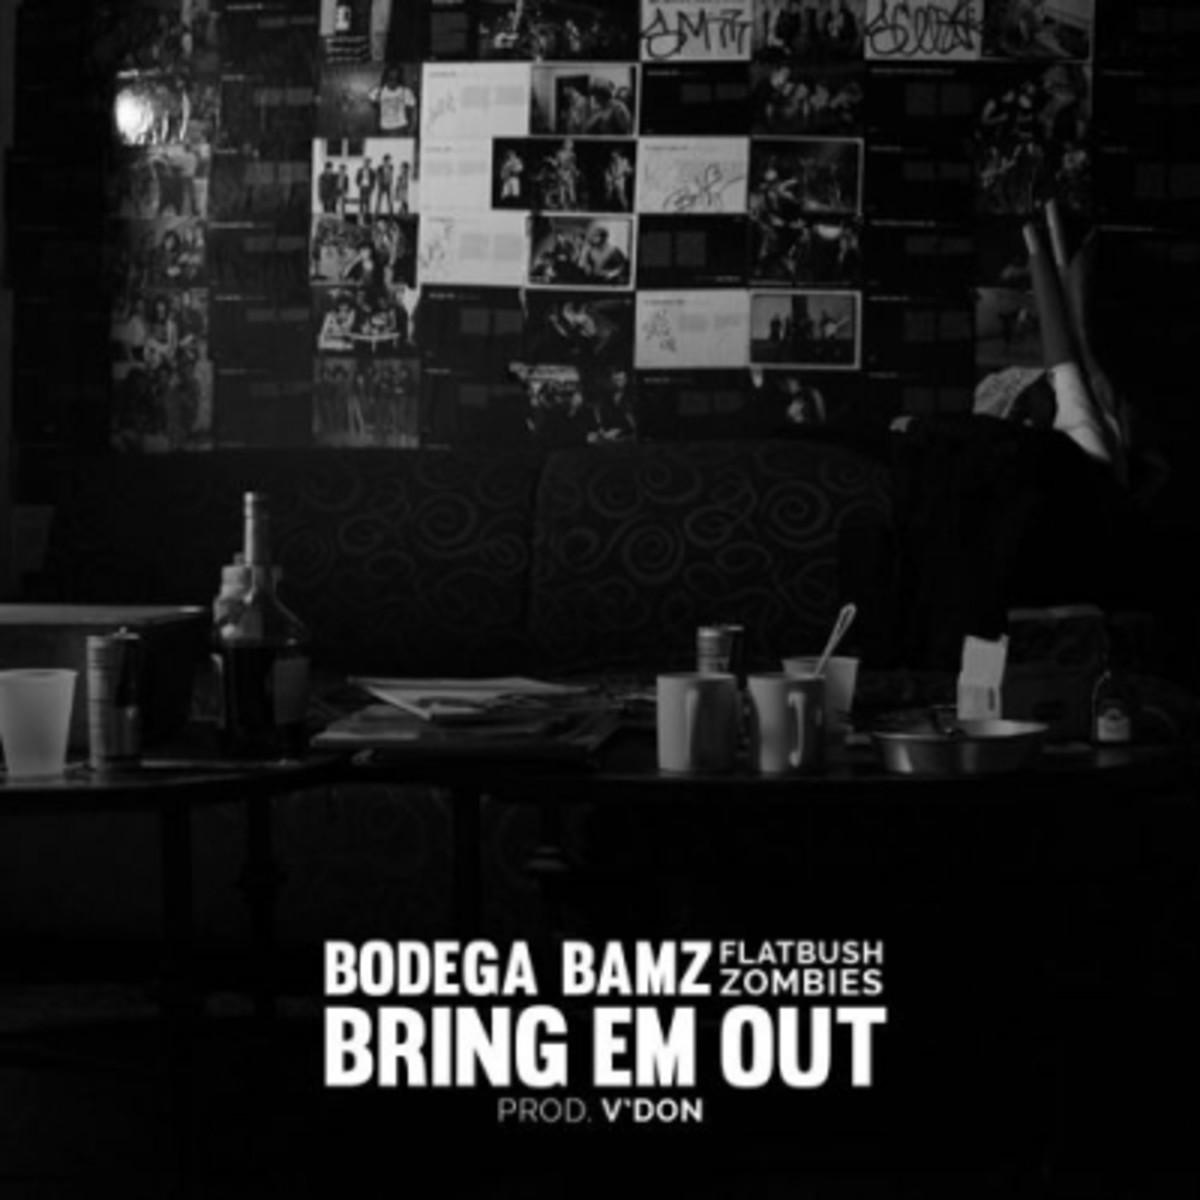 bodega-bamz-bring-em-out.jpg